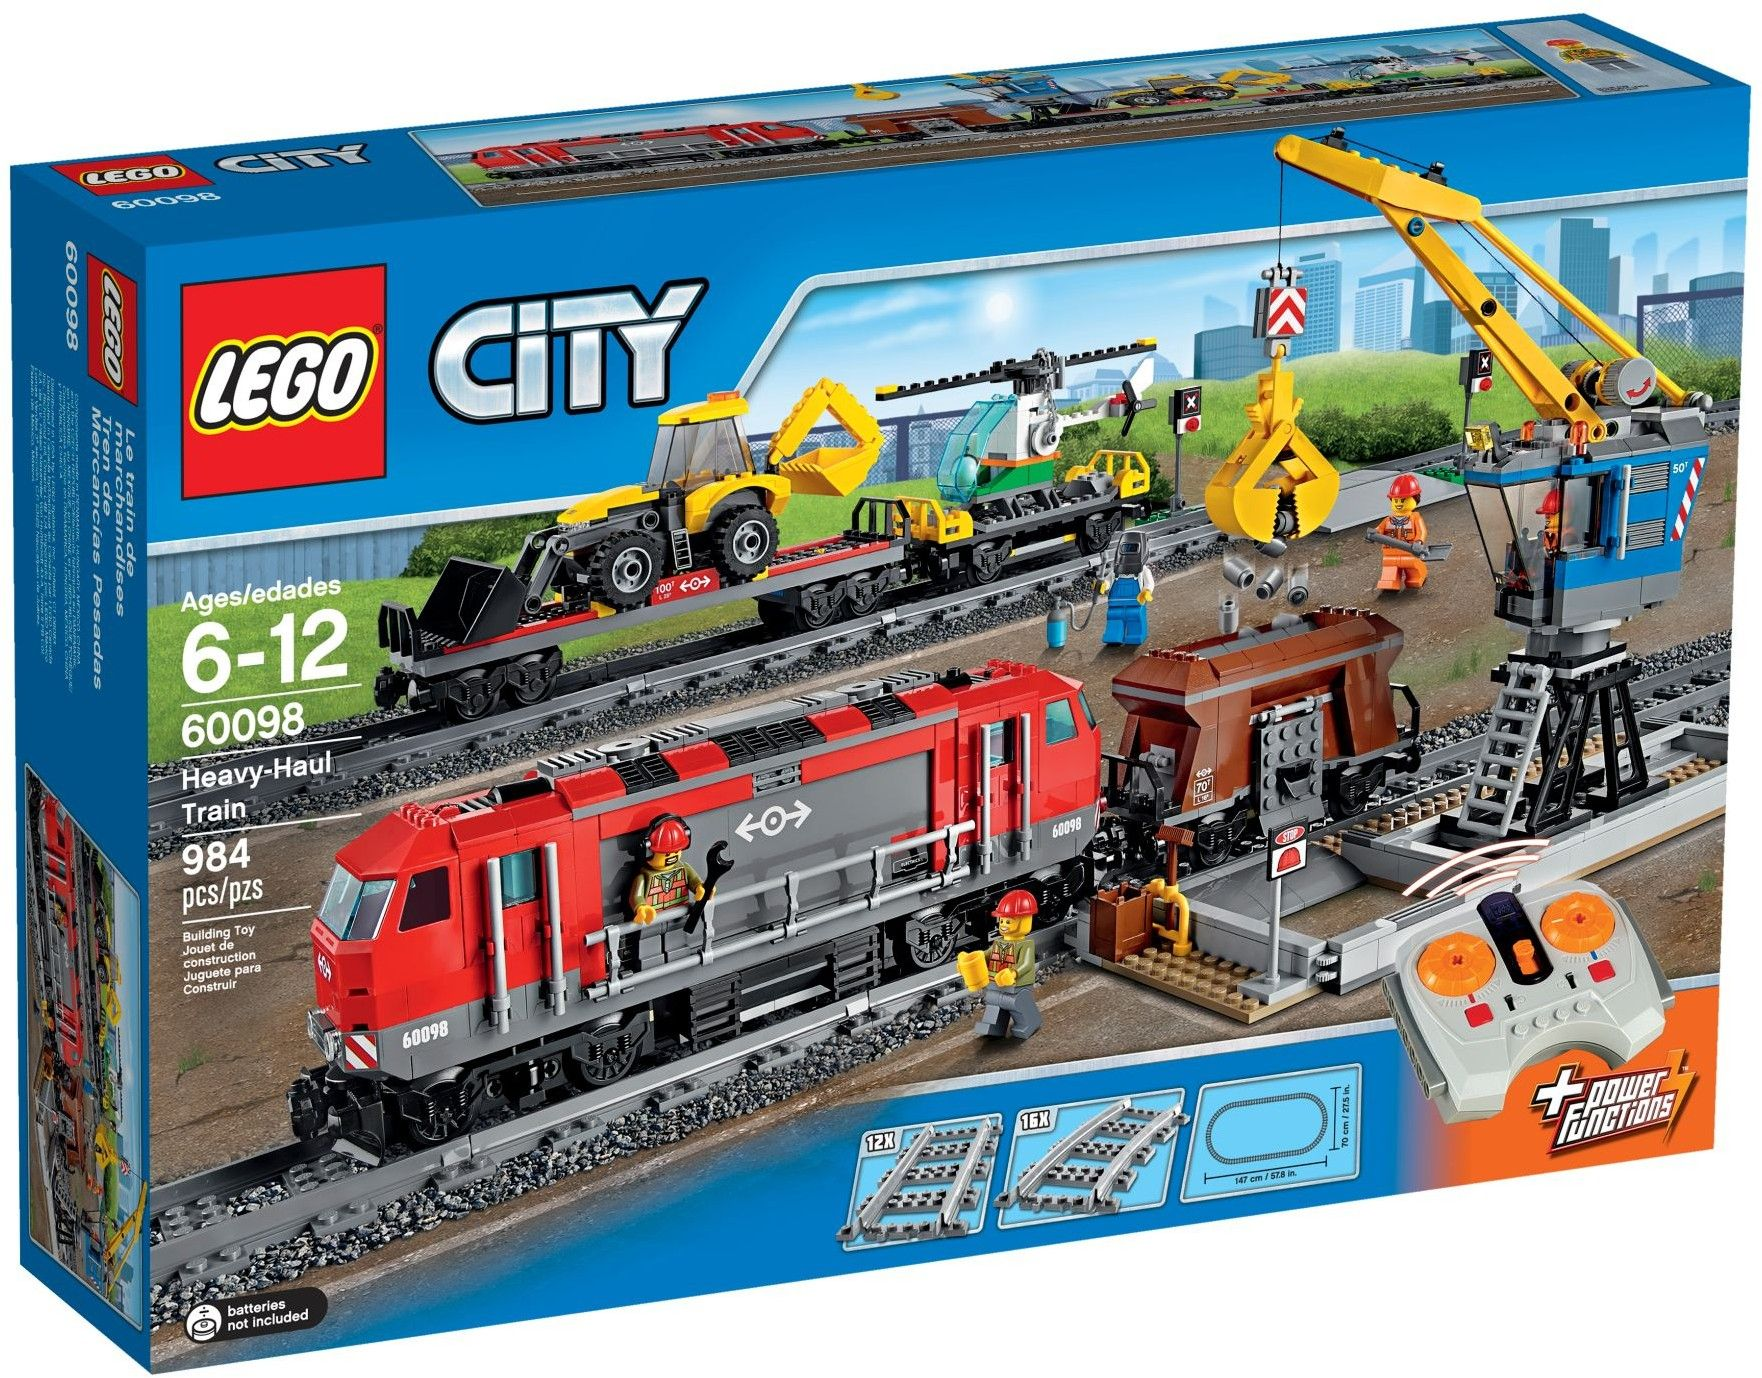 Cheap Bricks Lego 60098 Heavy Haul Train 2015 612 60098 629 984 Bootlegbricks Bricks Cheapbrick In 2020 Lego City Train Lego City Lego City Cargo Train